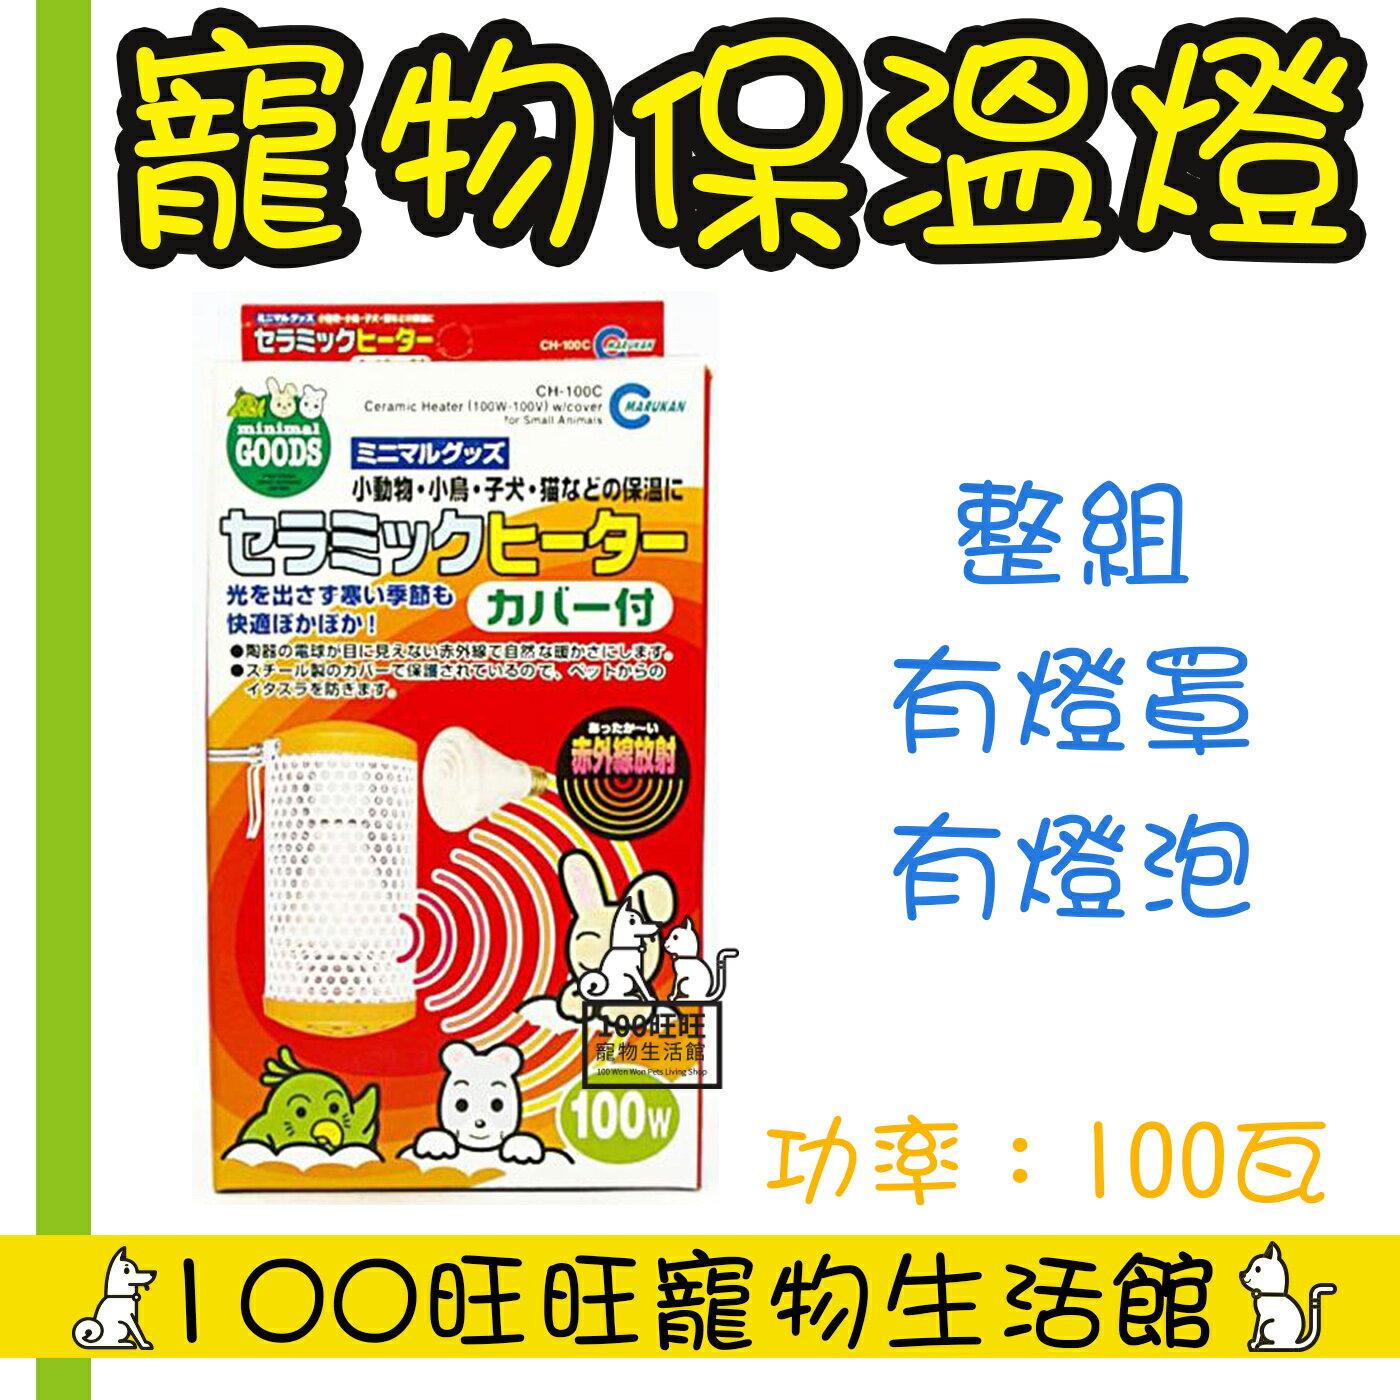 MARUKAN 寵物專用 CH-100C 陶瓷保溫燈泡組 100w 有燈泡 有燈罩 保溫燈泡【組】